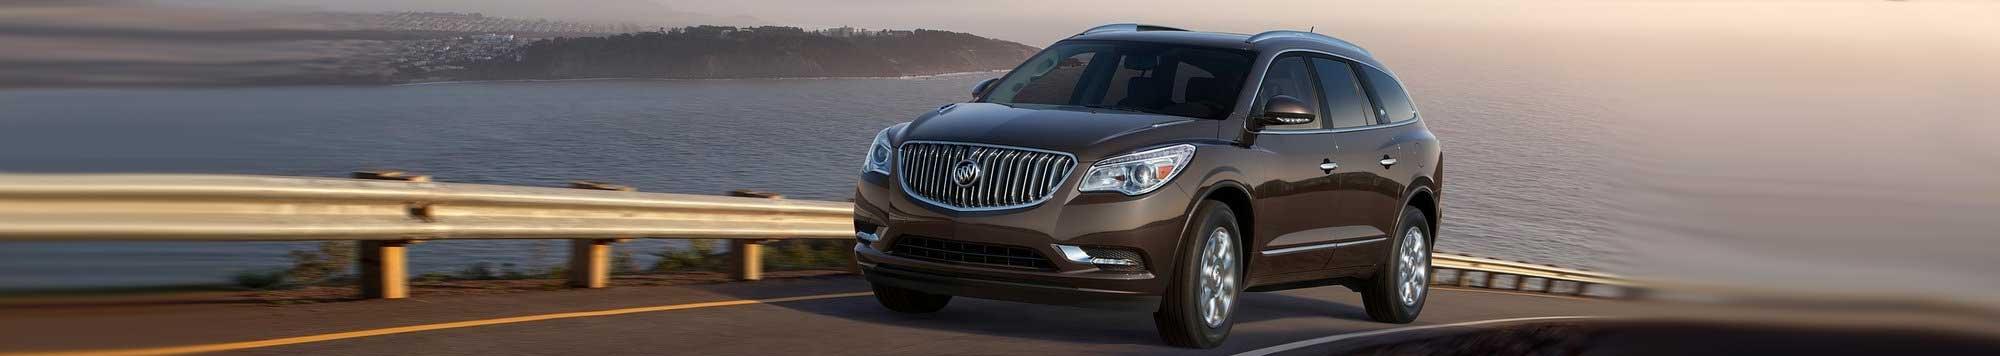 M & D AUTO SALES INC - Used Cars - Little Rock AR Dealer